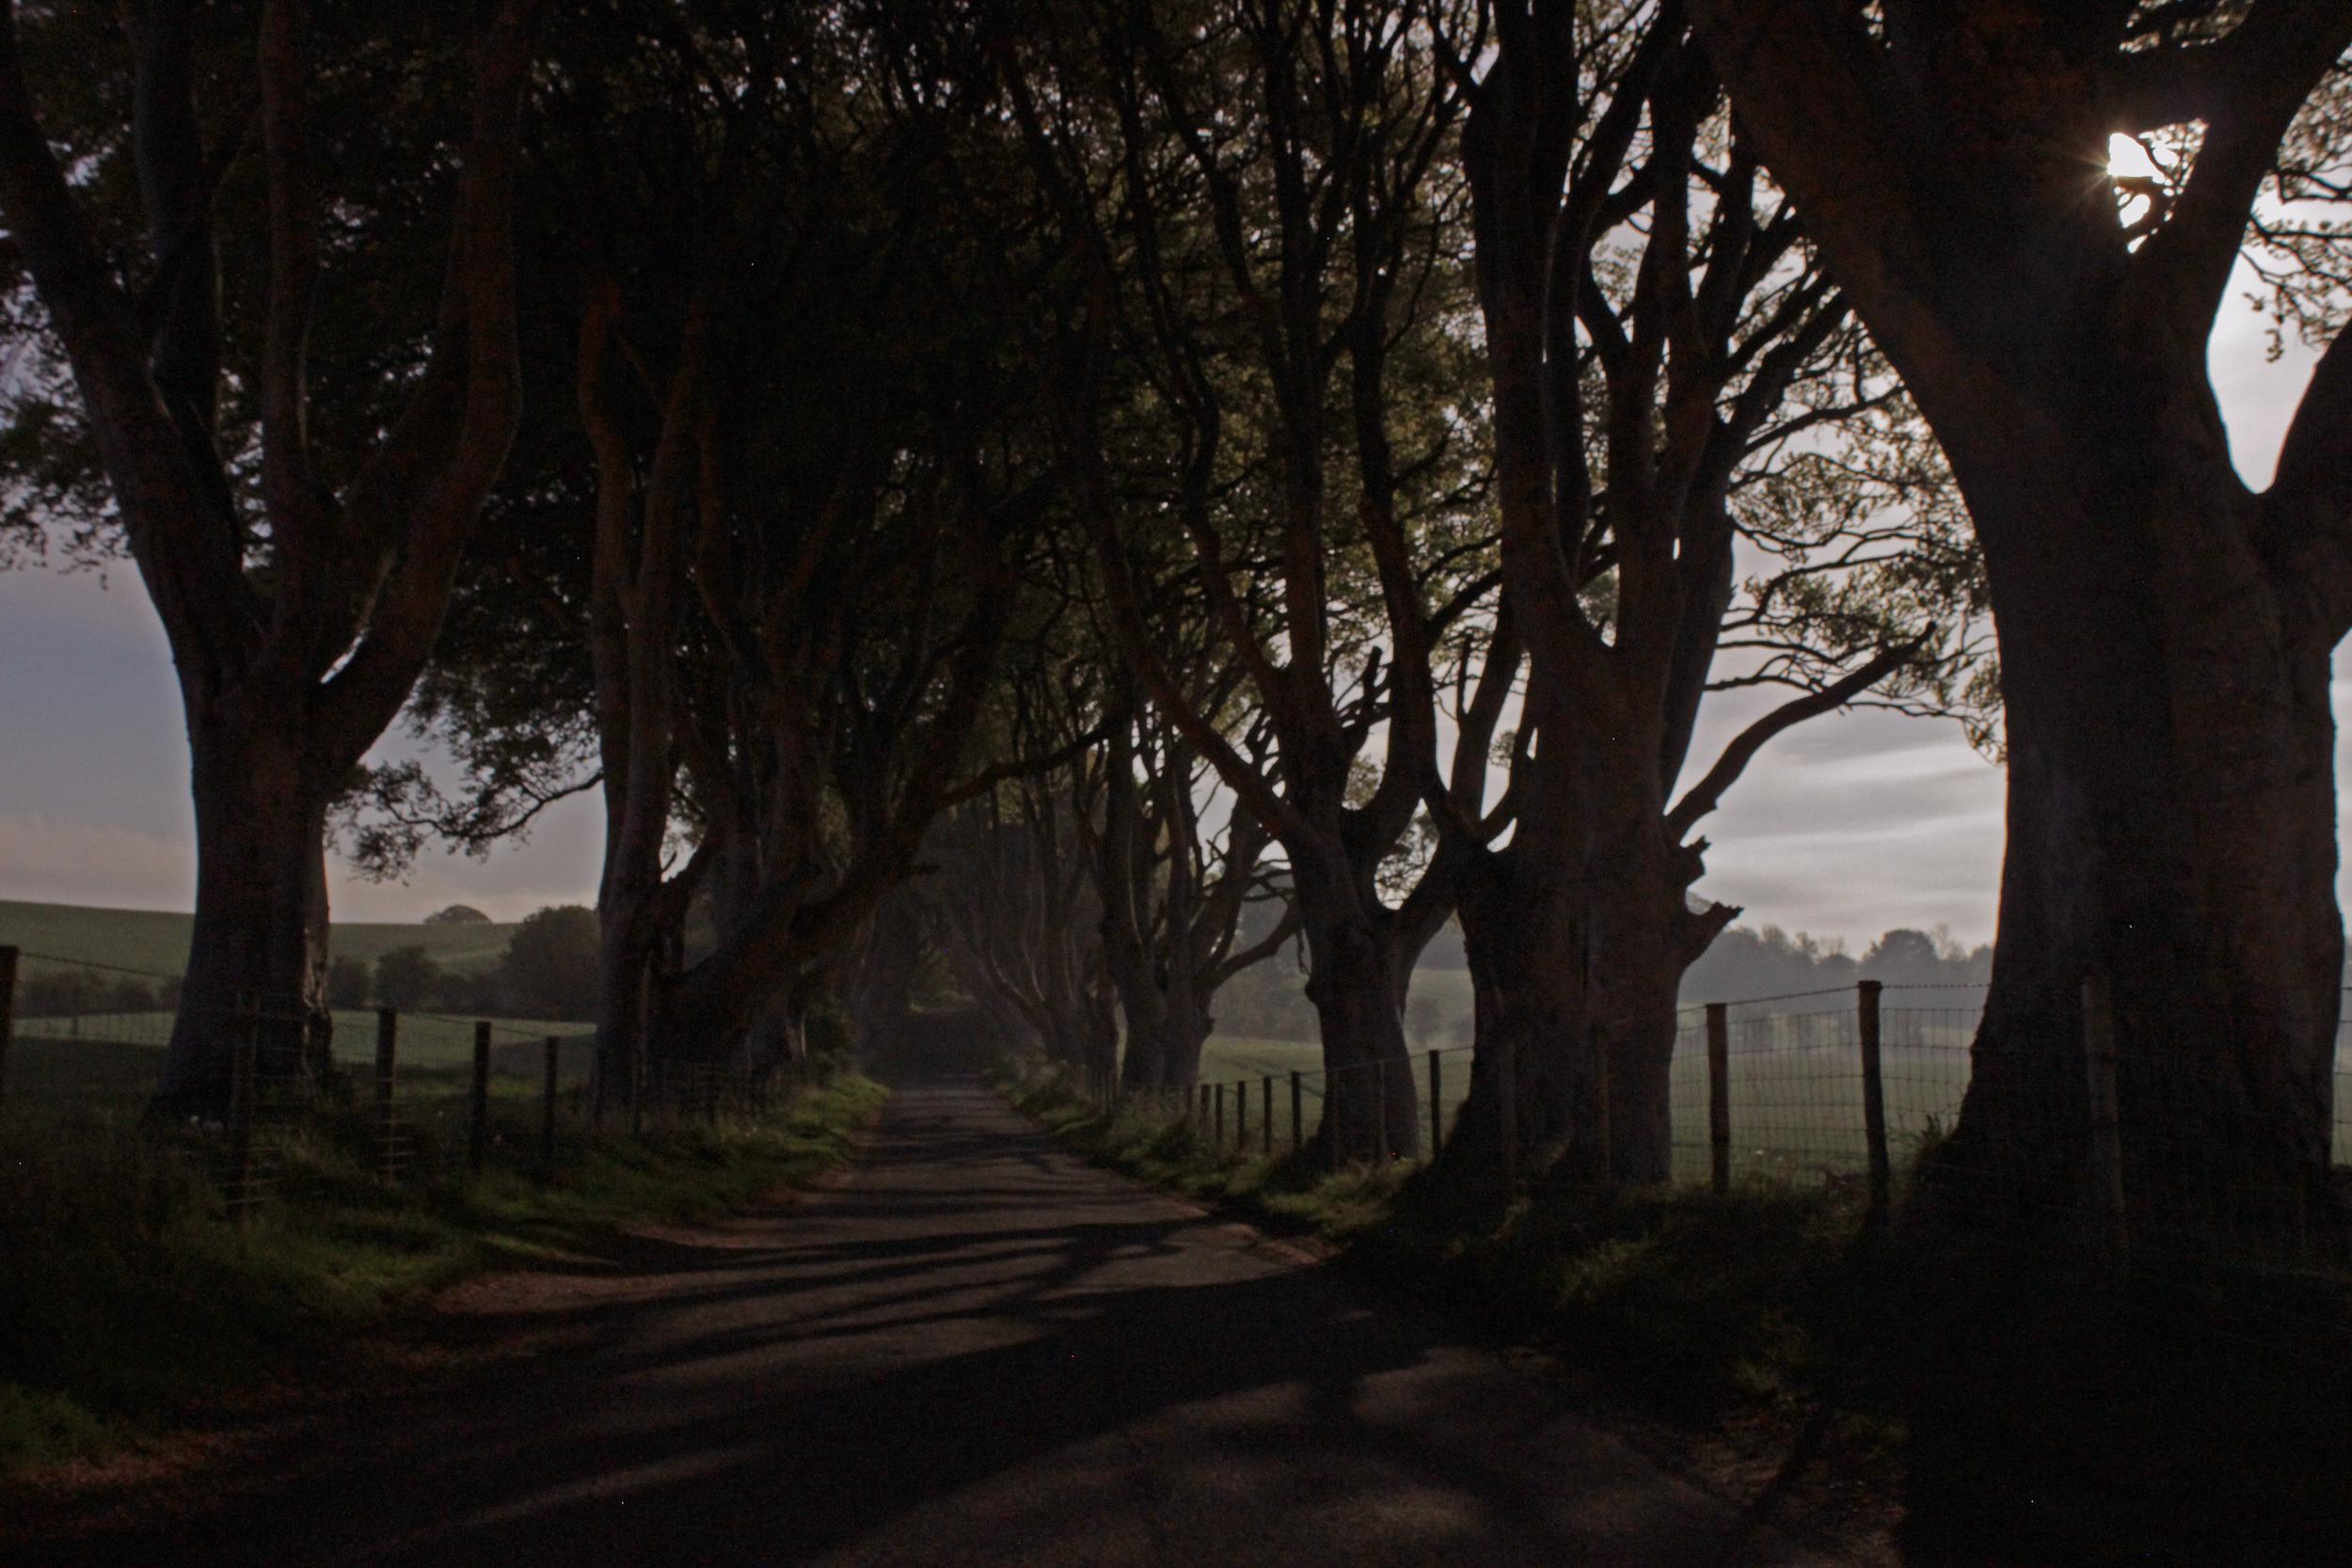 The Dark Hedges, Co. Antrim